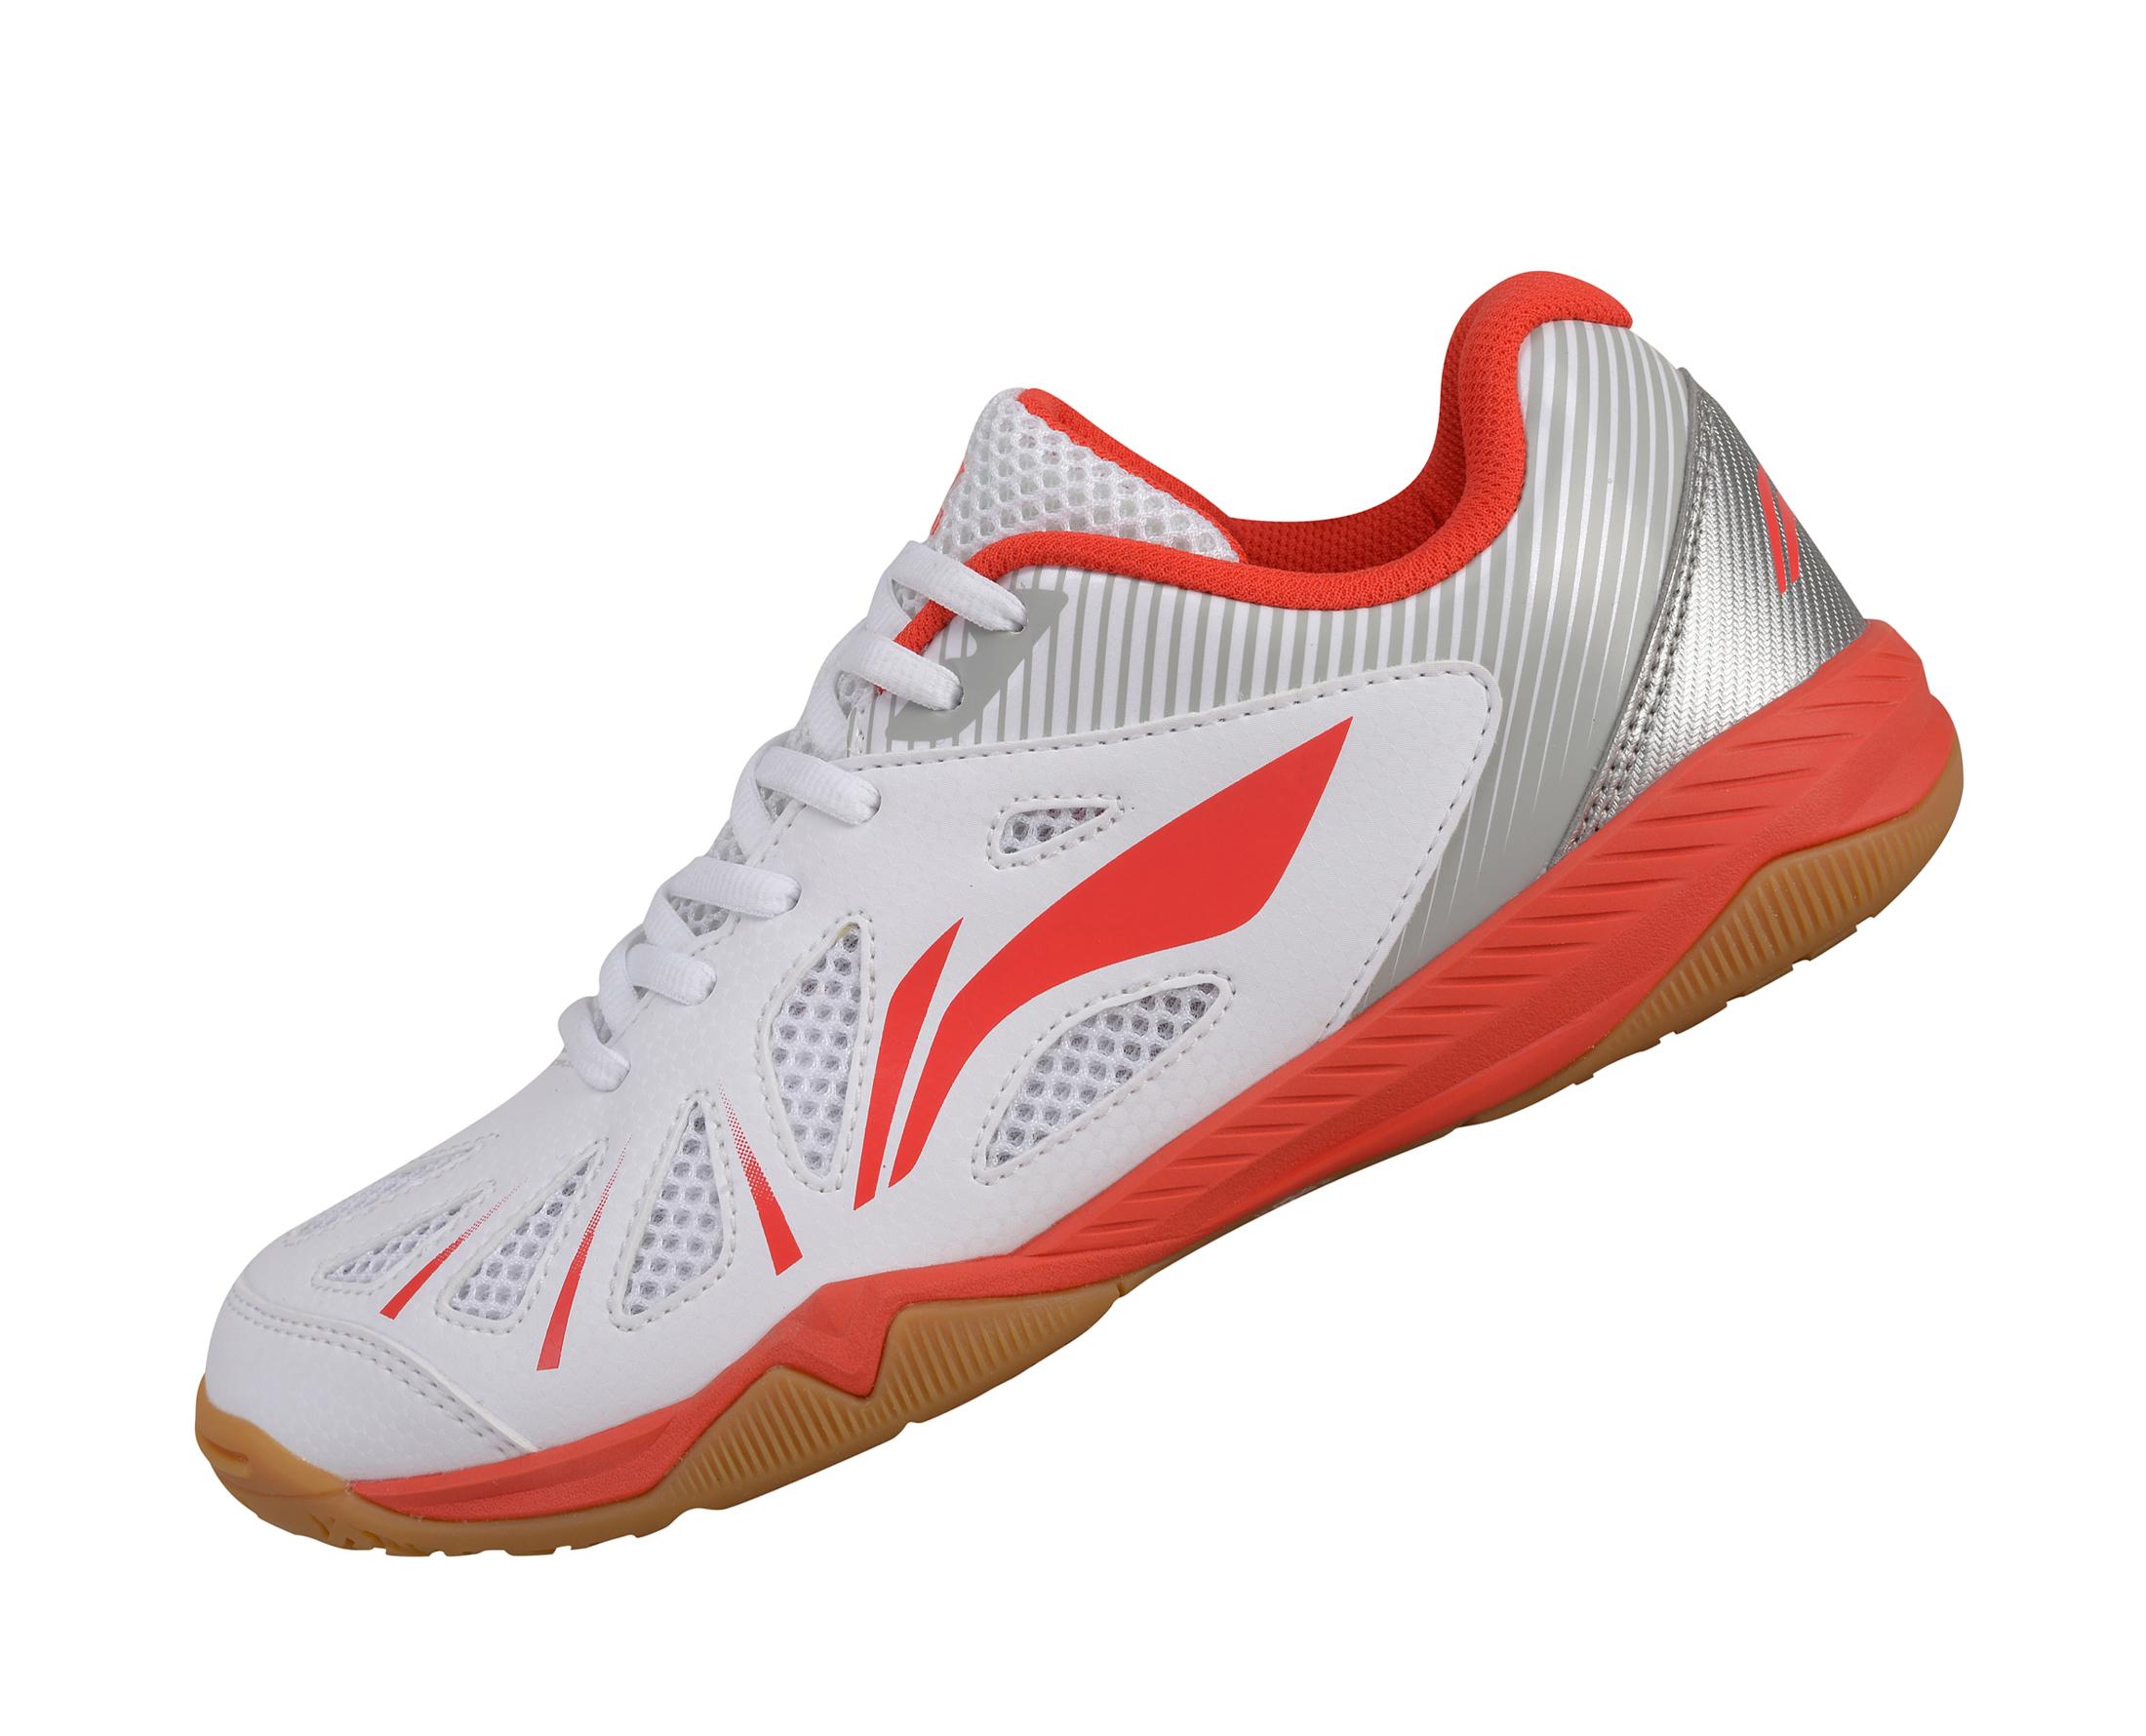 li ning women s table tennis shoes table tennis footwear aptm004 1 rh shoptabletennisonline com table tennis shoes nike table tennis shoes nike